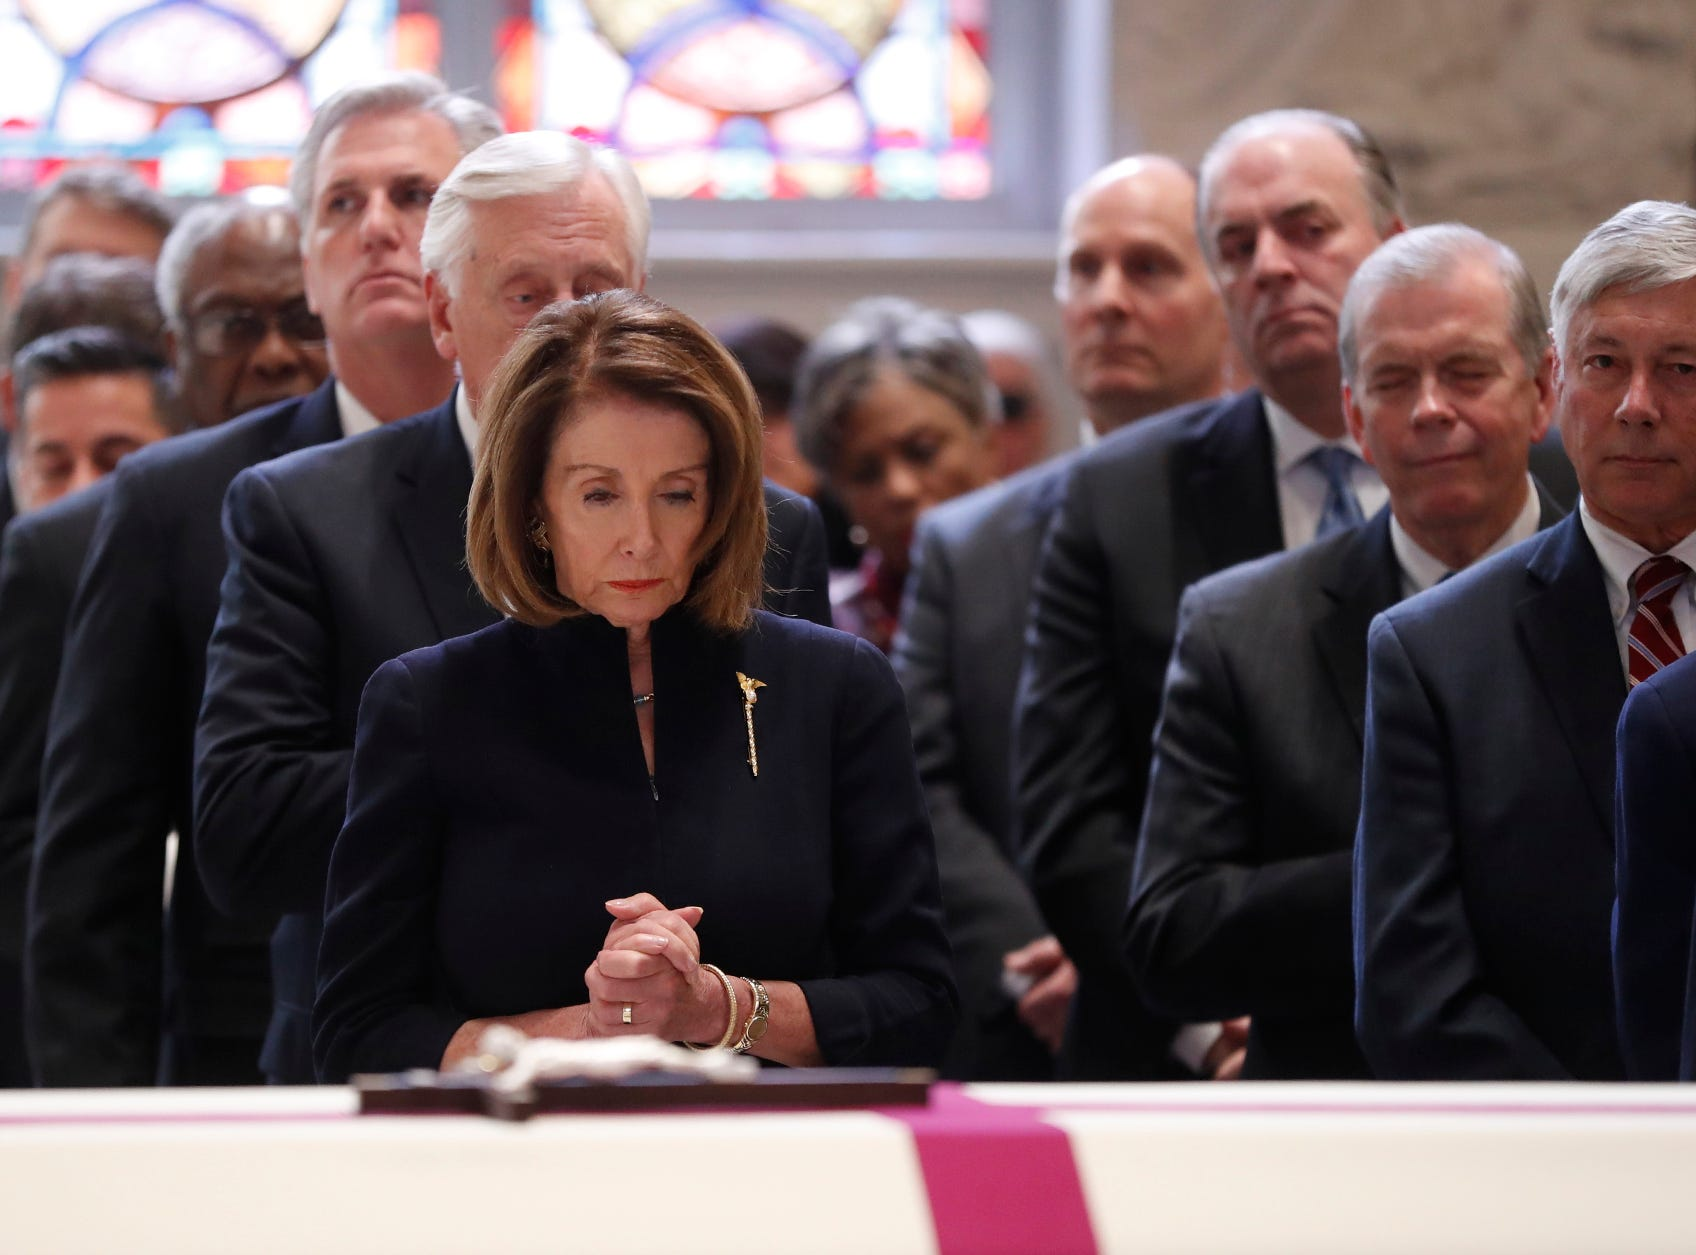 House Speaker Nancy Pelosi stands during the funeral for former Rep. John Dingell, D-Dearborn.